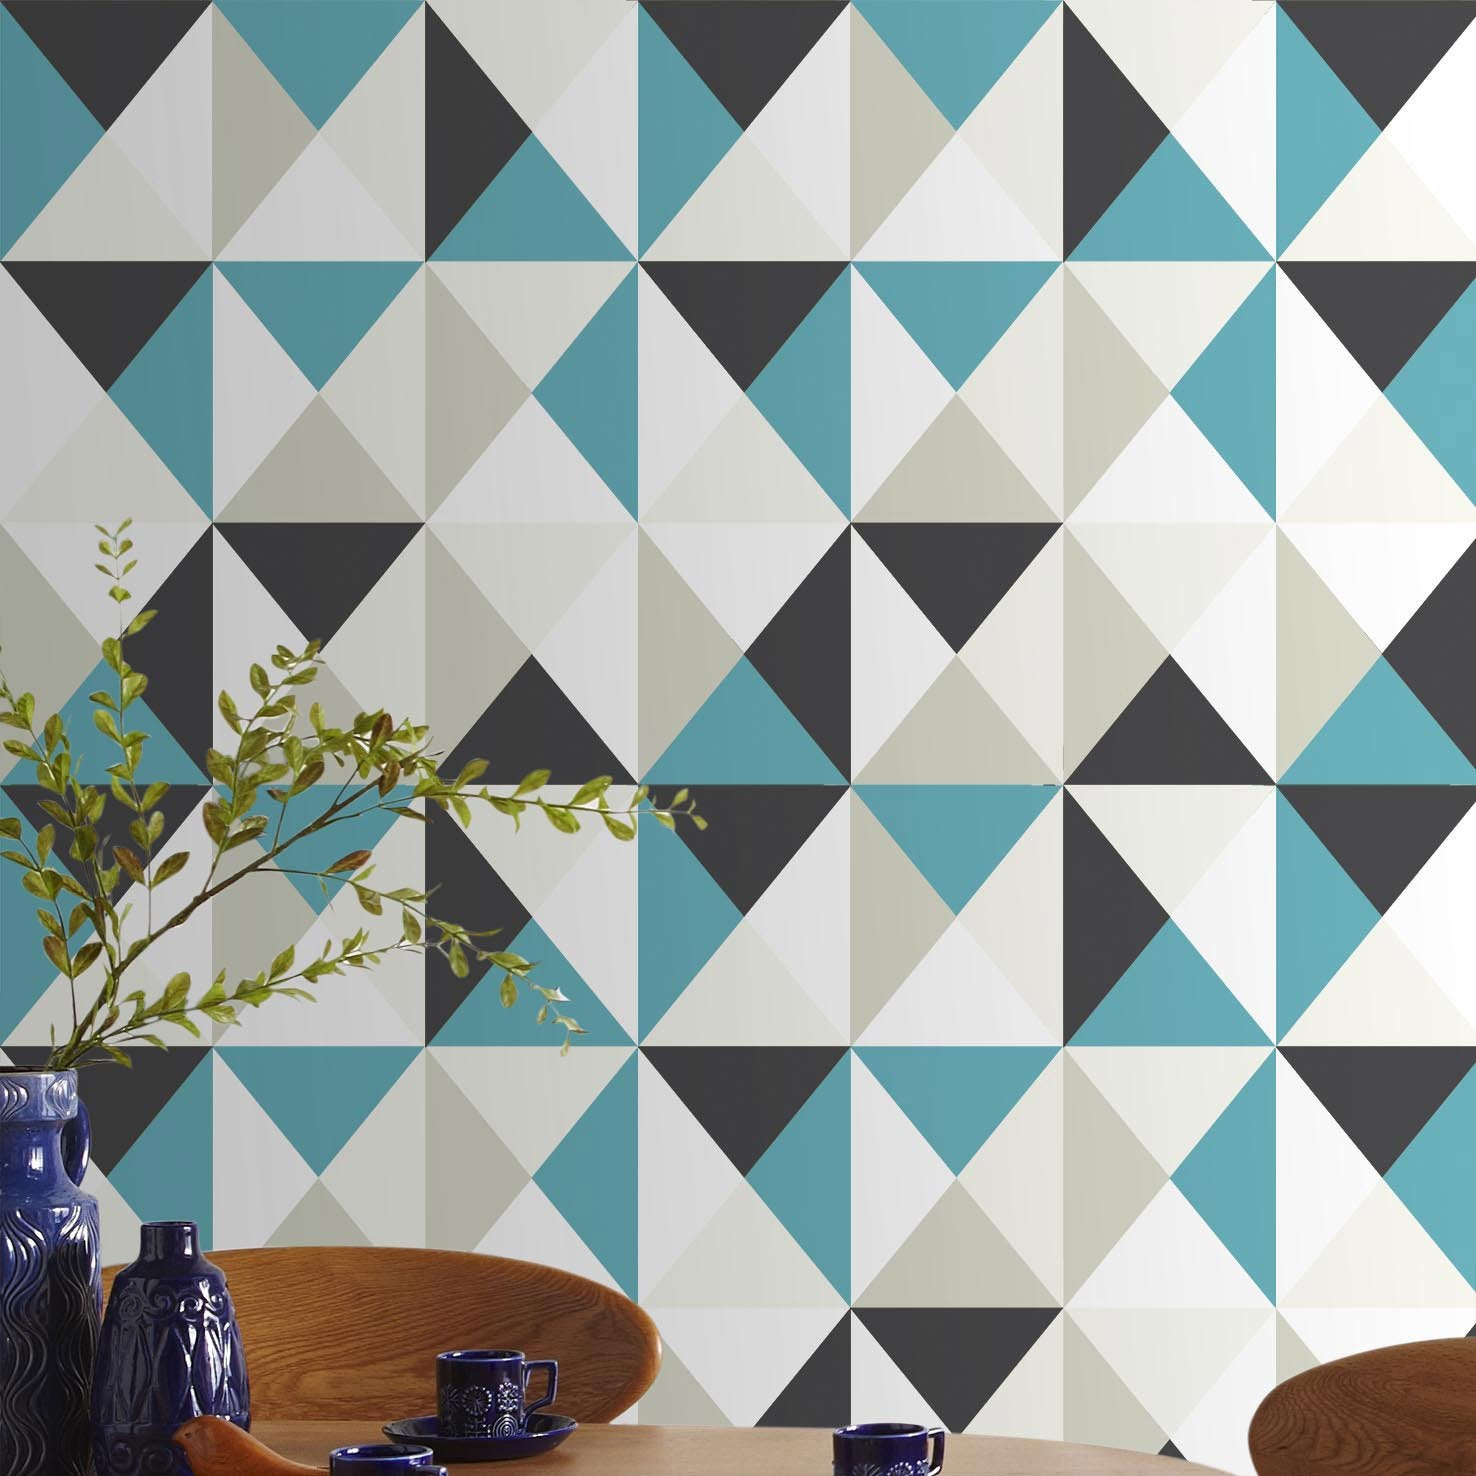 Papier Peint Intisse Polygone Bleu Leroy Merlin